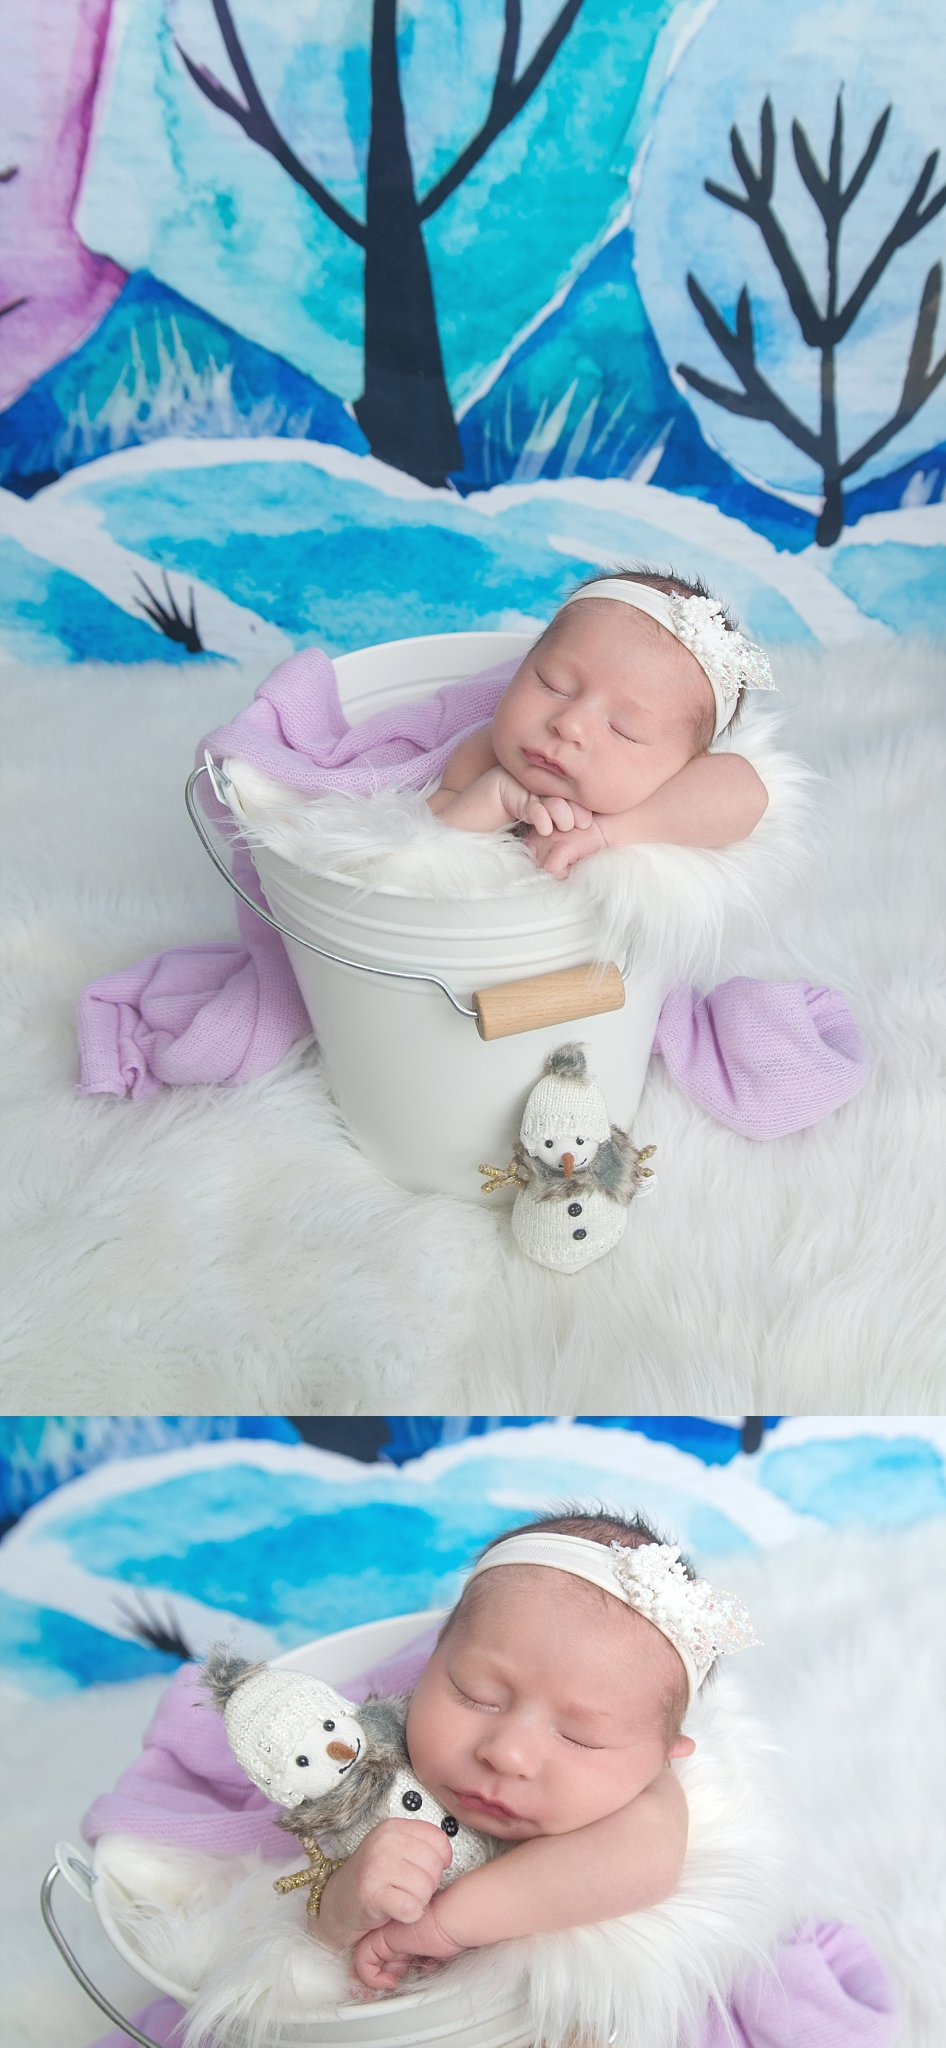 st-louis-newborn-photographer-baby-girl-on-snow-scene-with-snowman.jpg